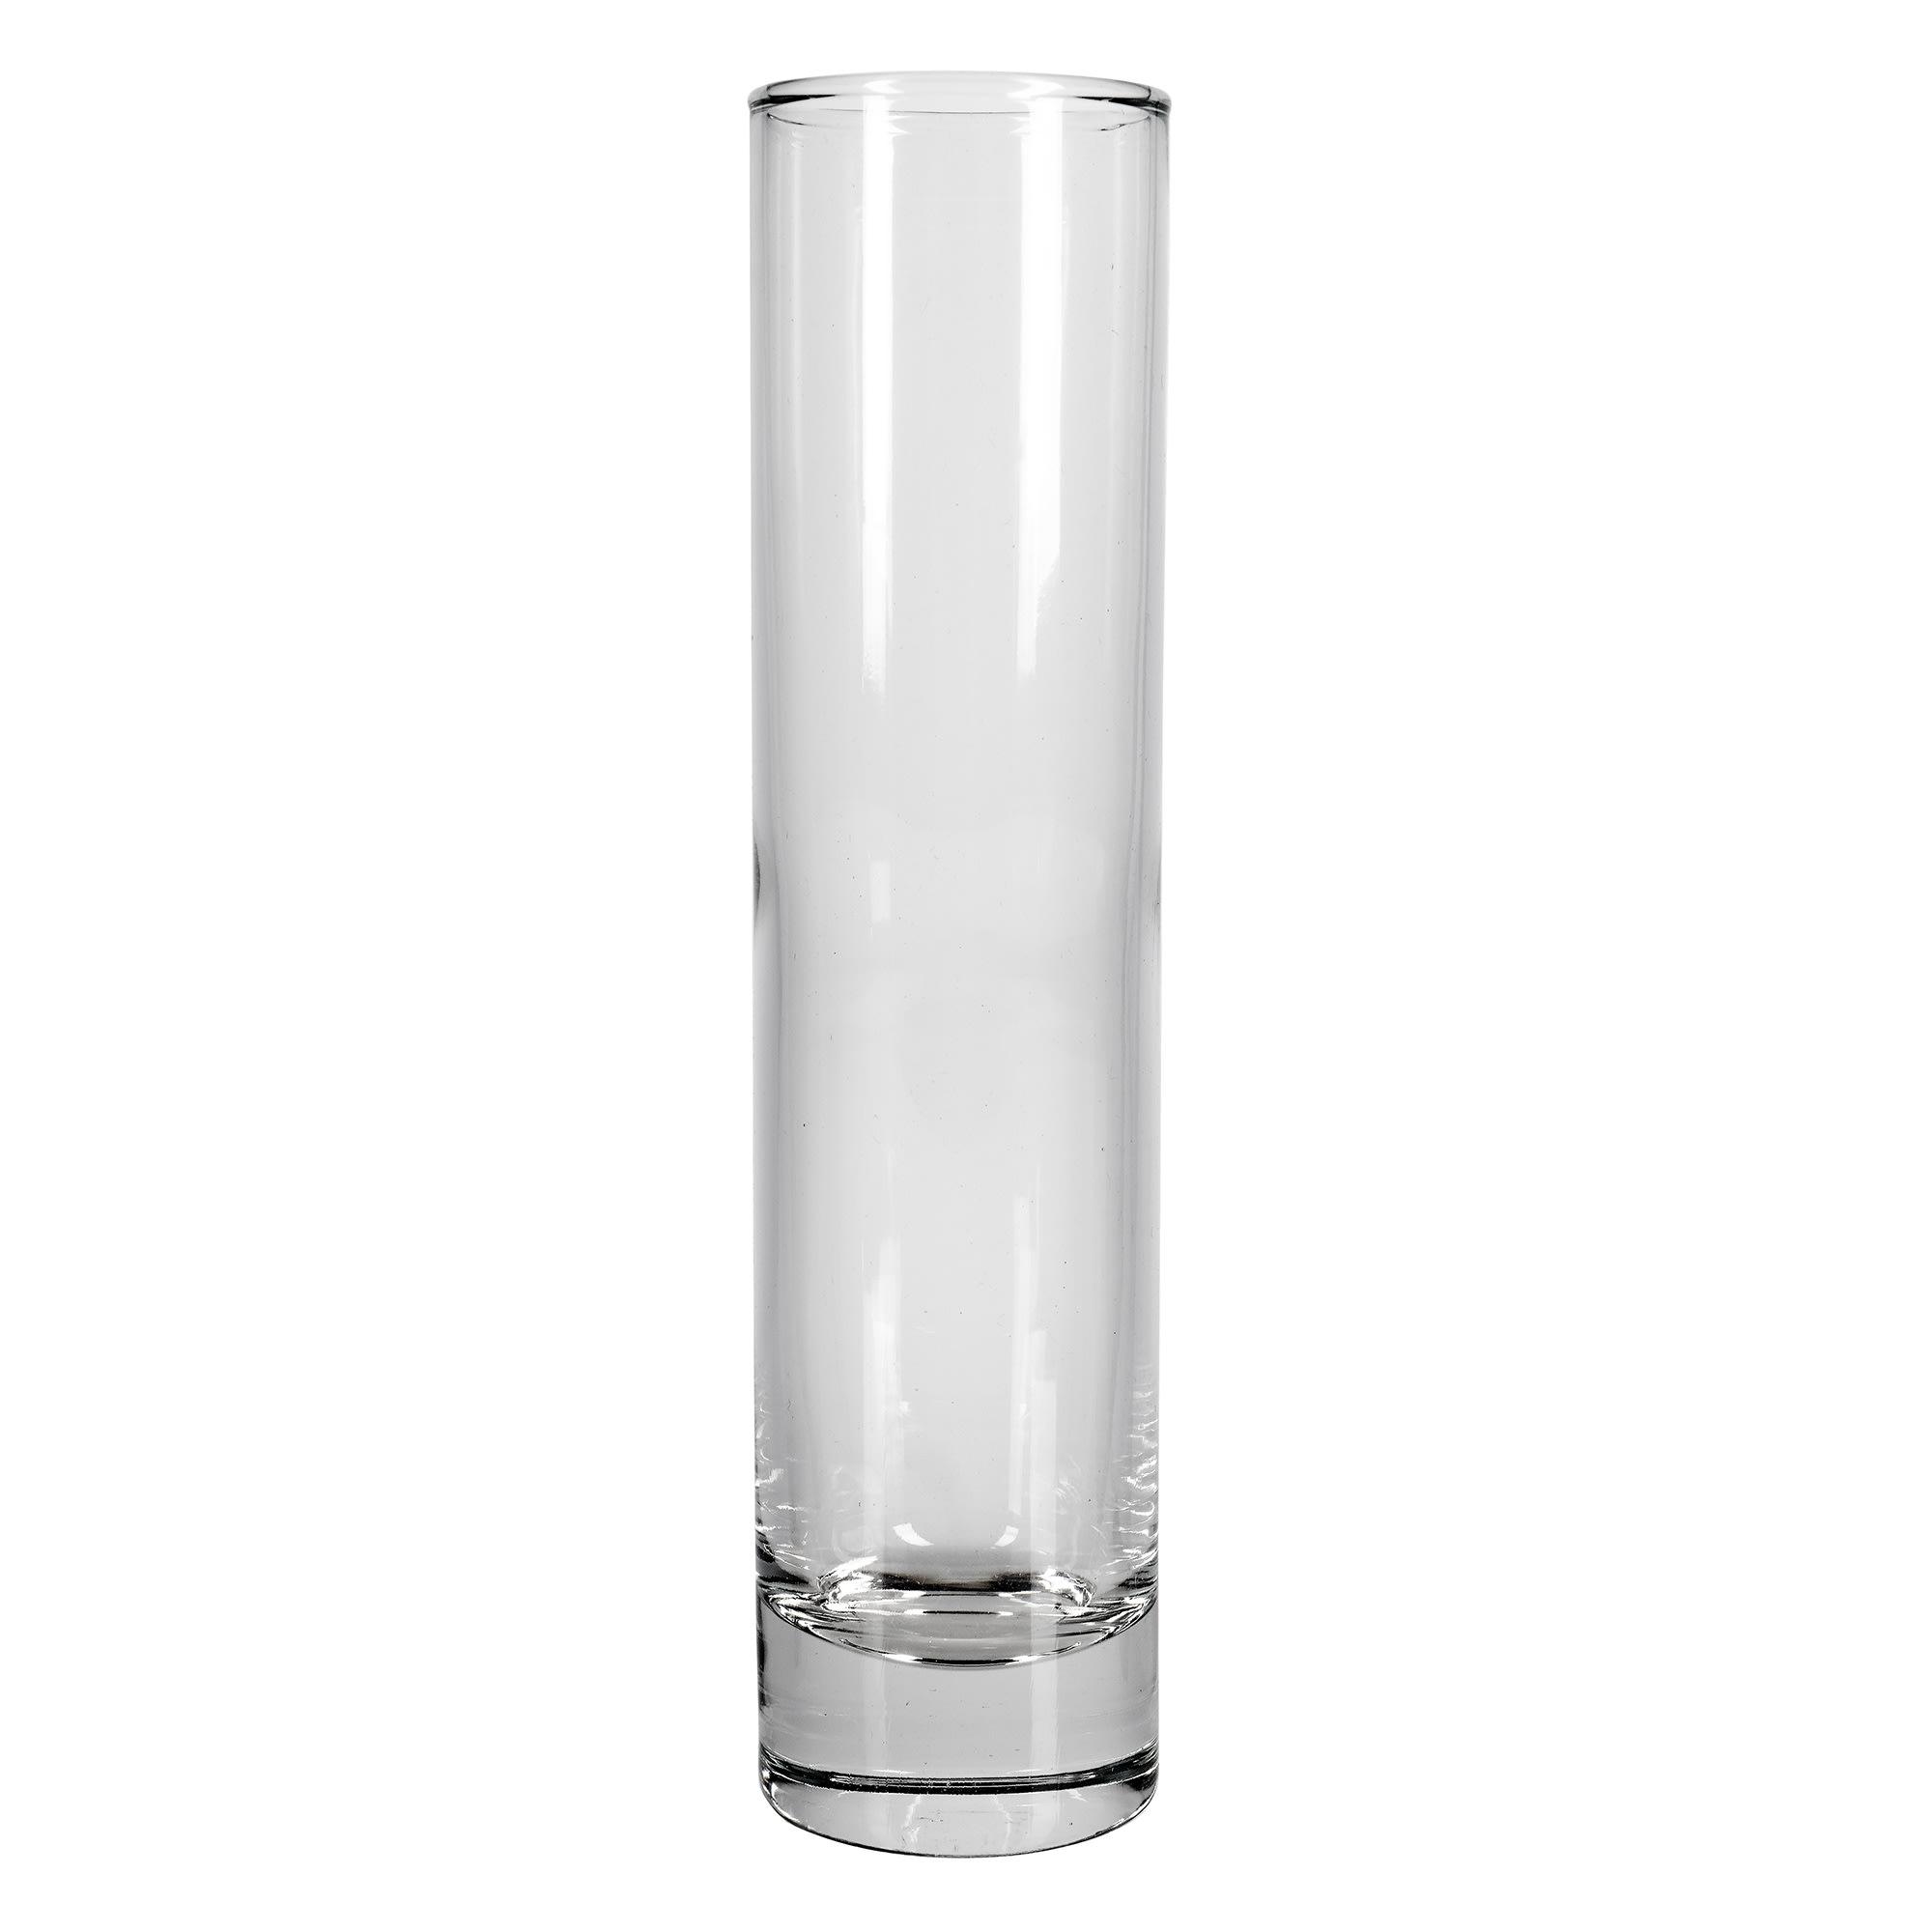 Libbey 2824 6.75 oz Glass Cylinder Bud Vase